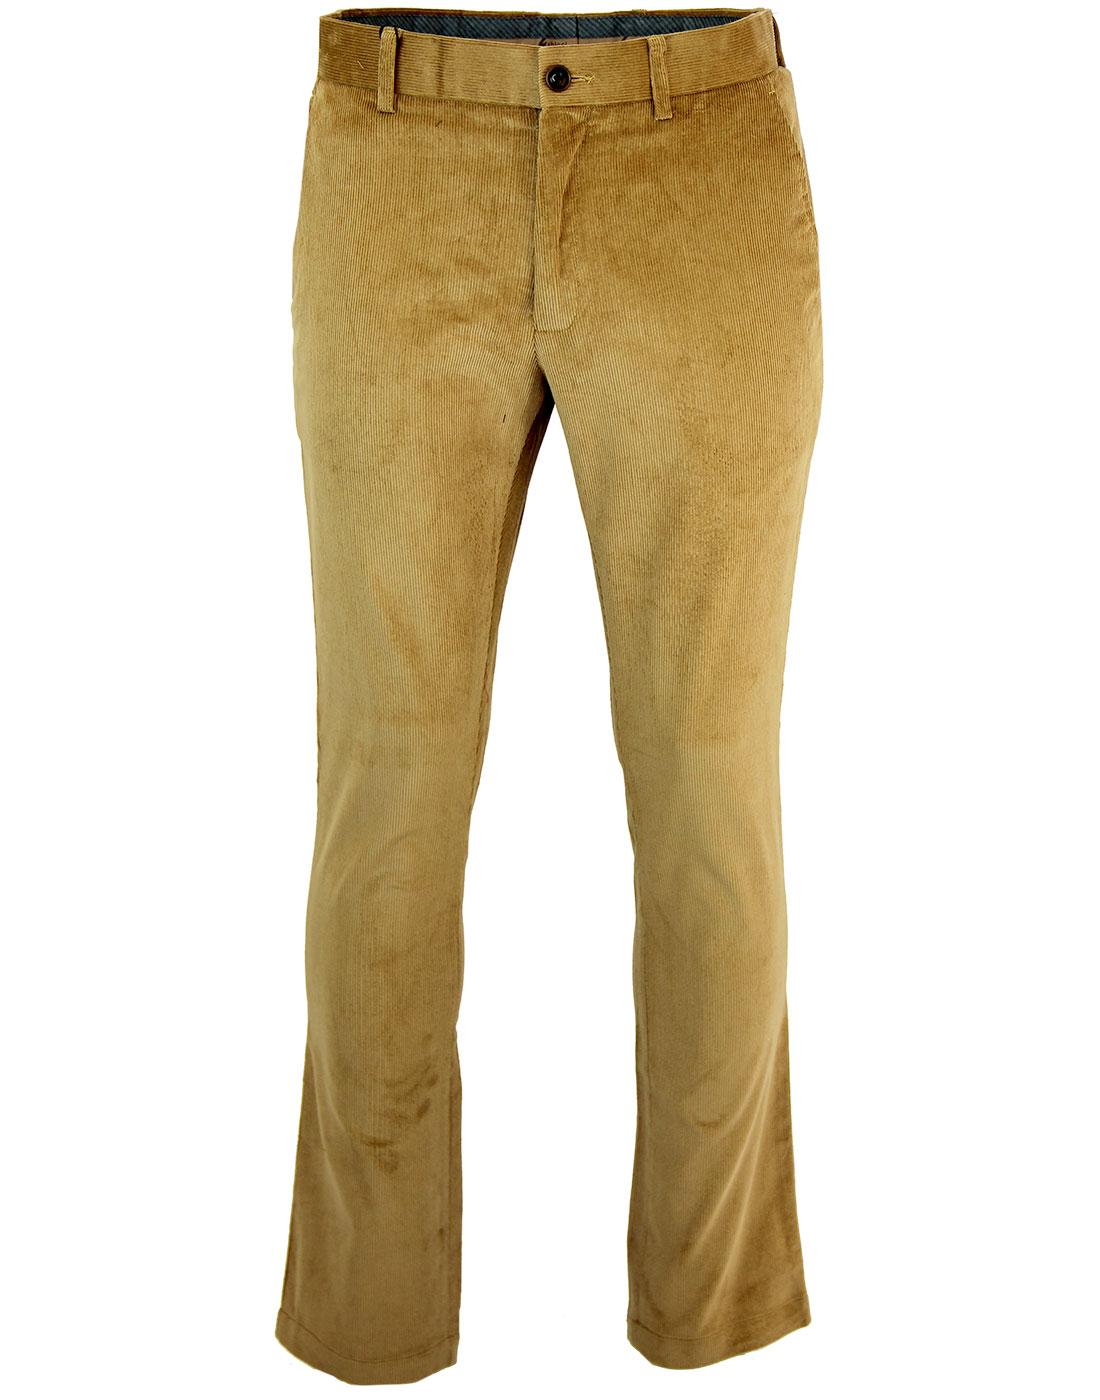 GABICCI VINTAGE 60s Mod Cord Trousers